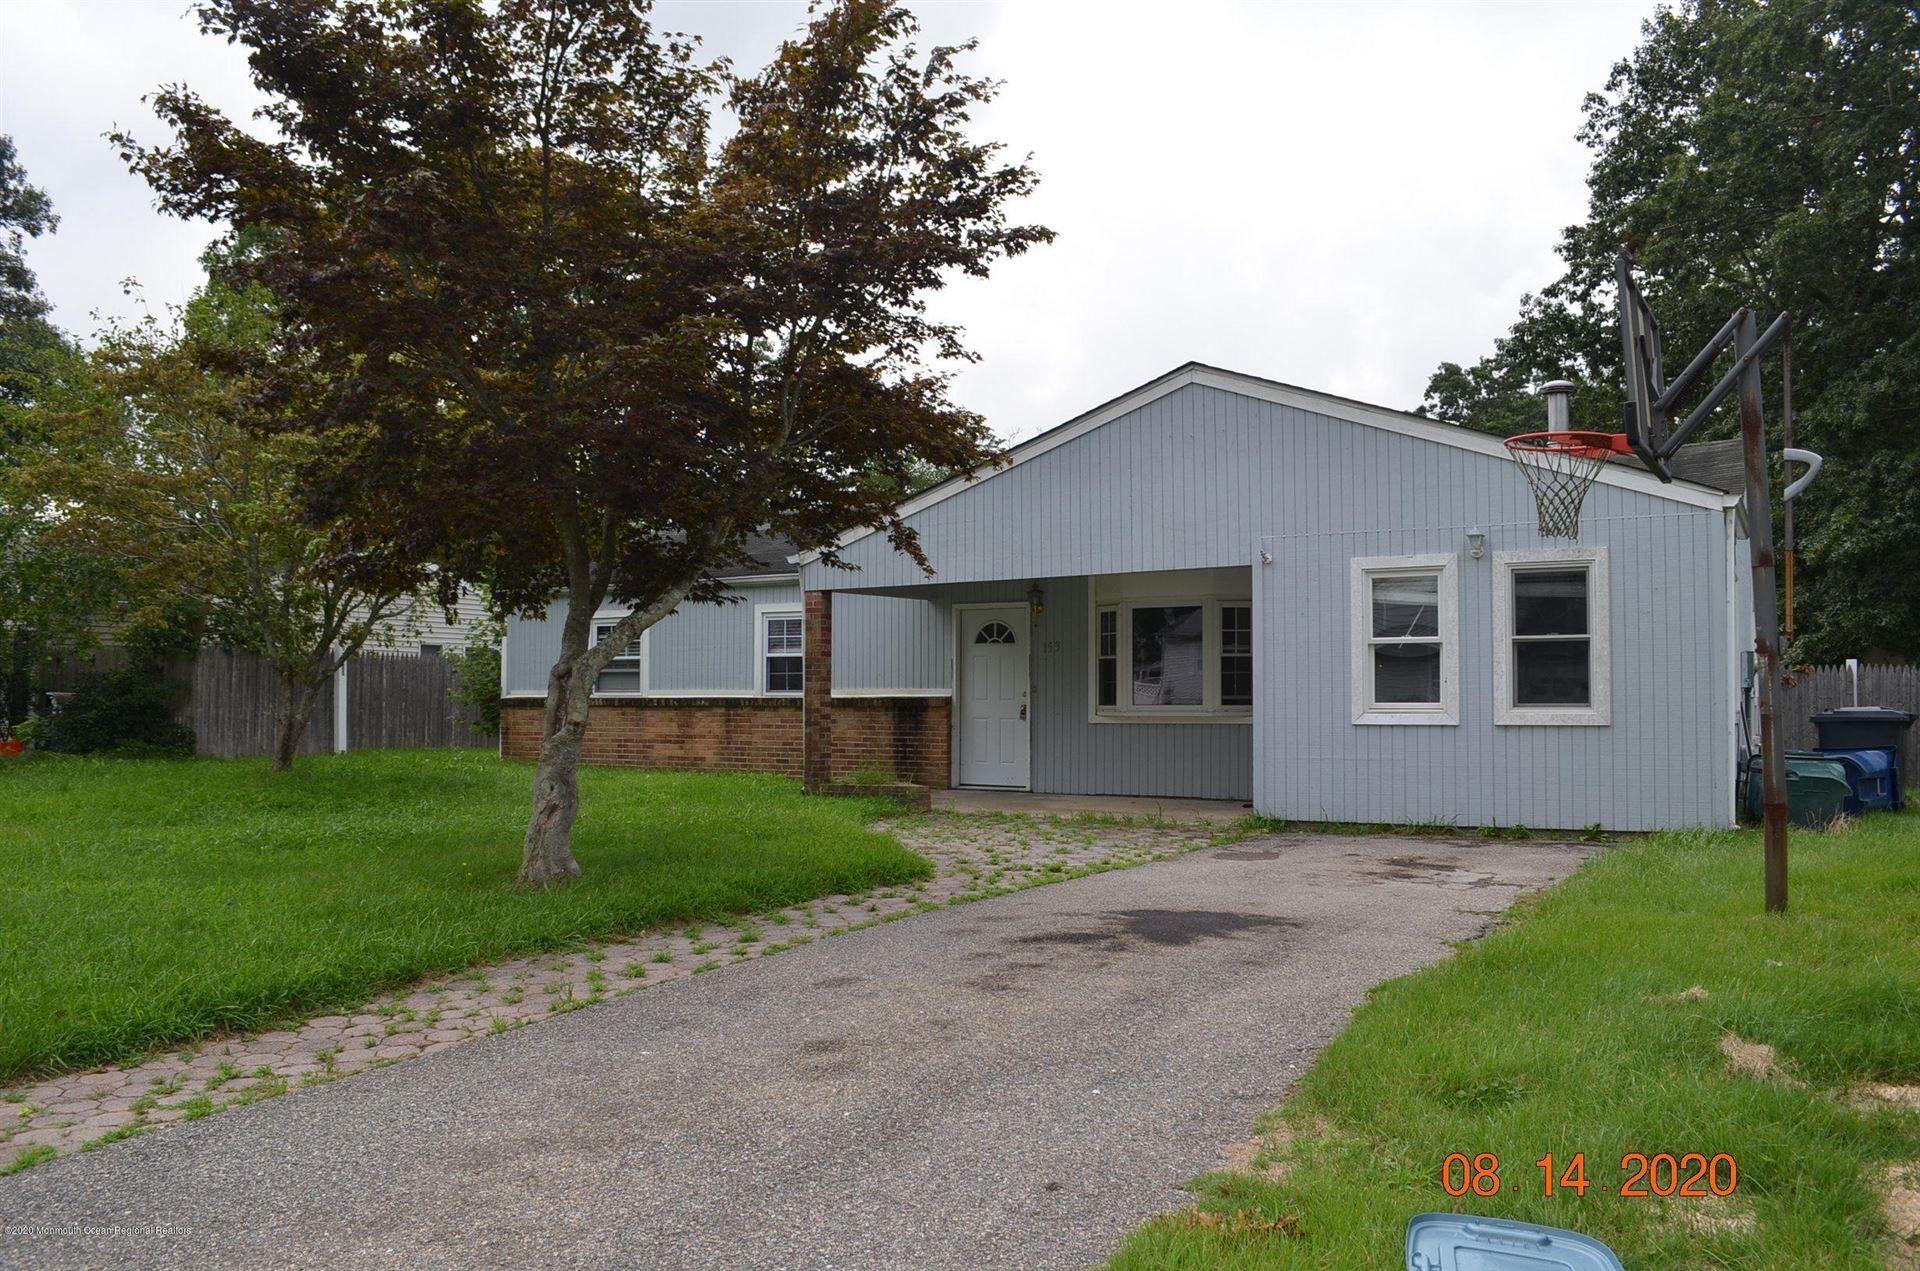 153 Oak Leaf Drive, Little Egg Harbor, NJ 08087 - MLS#: 22028449